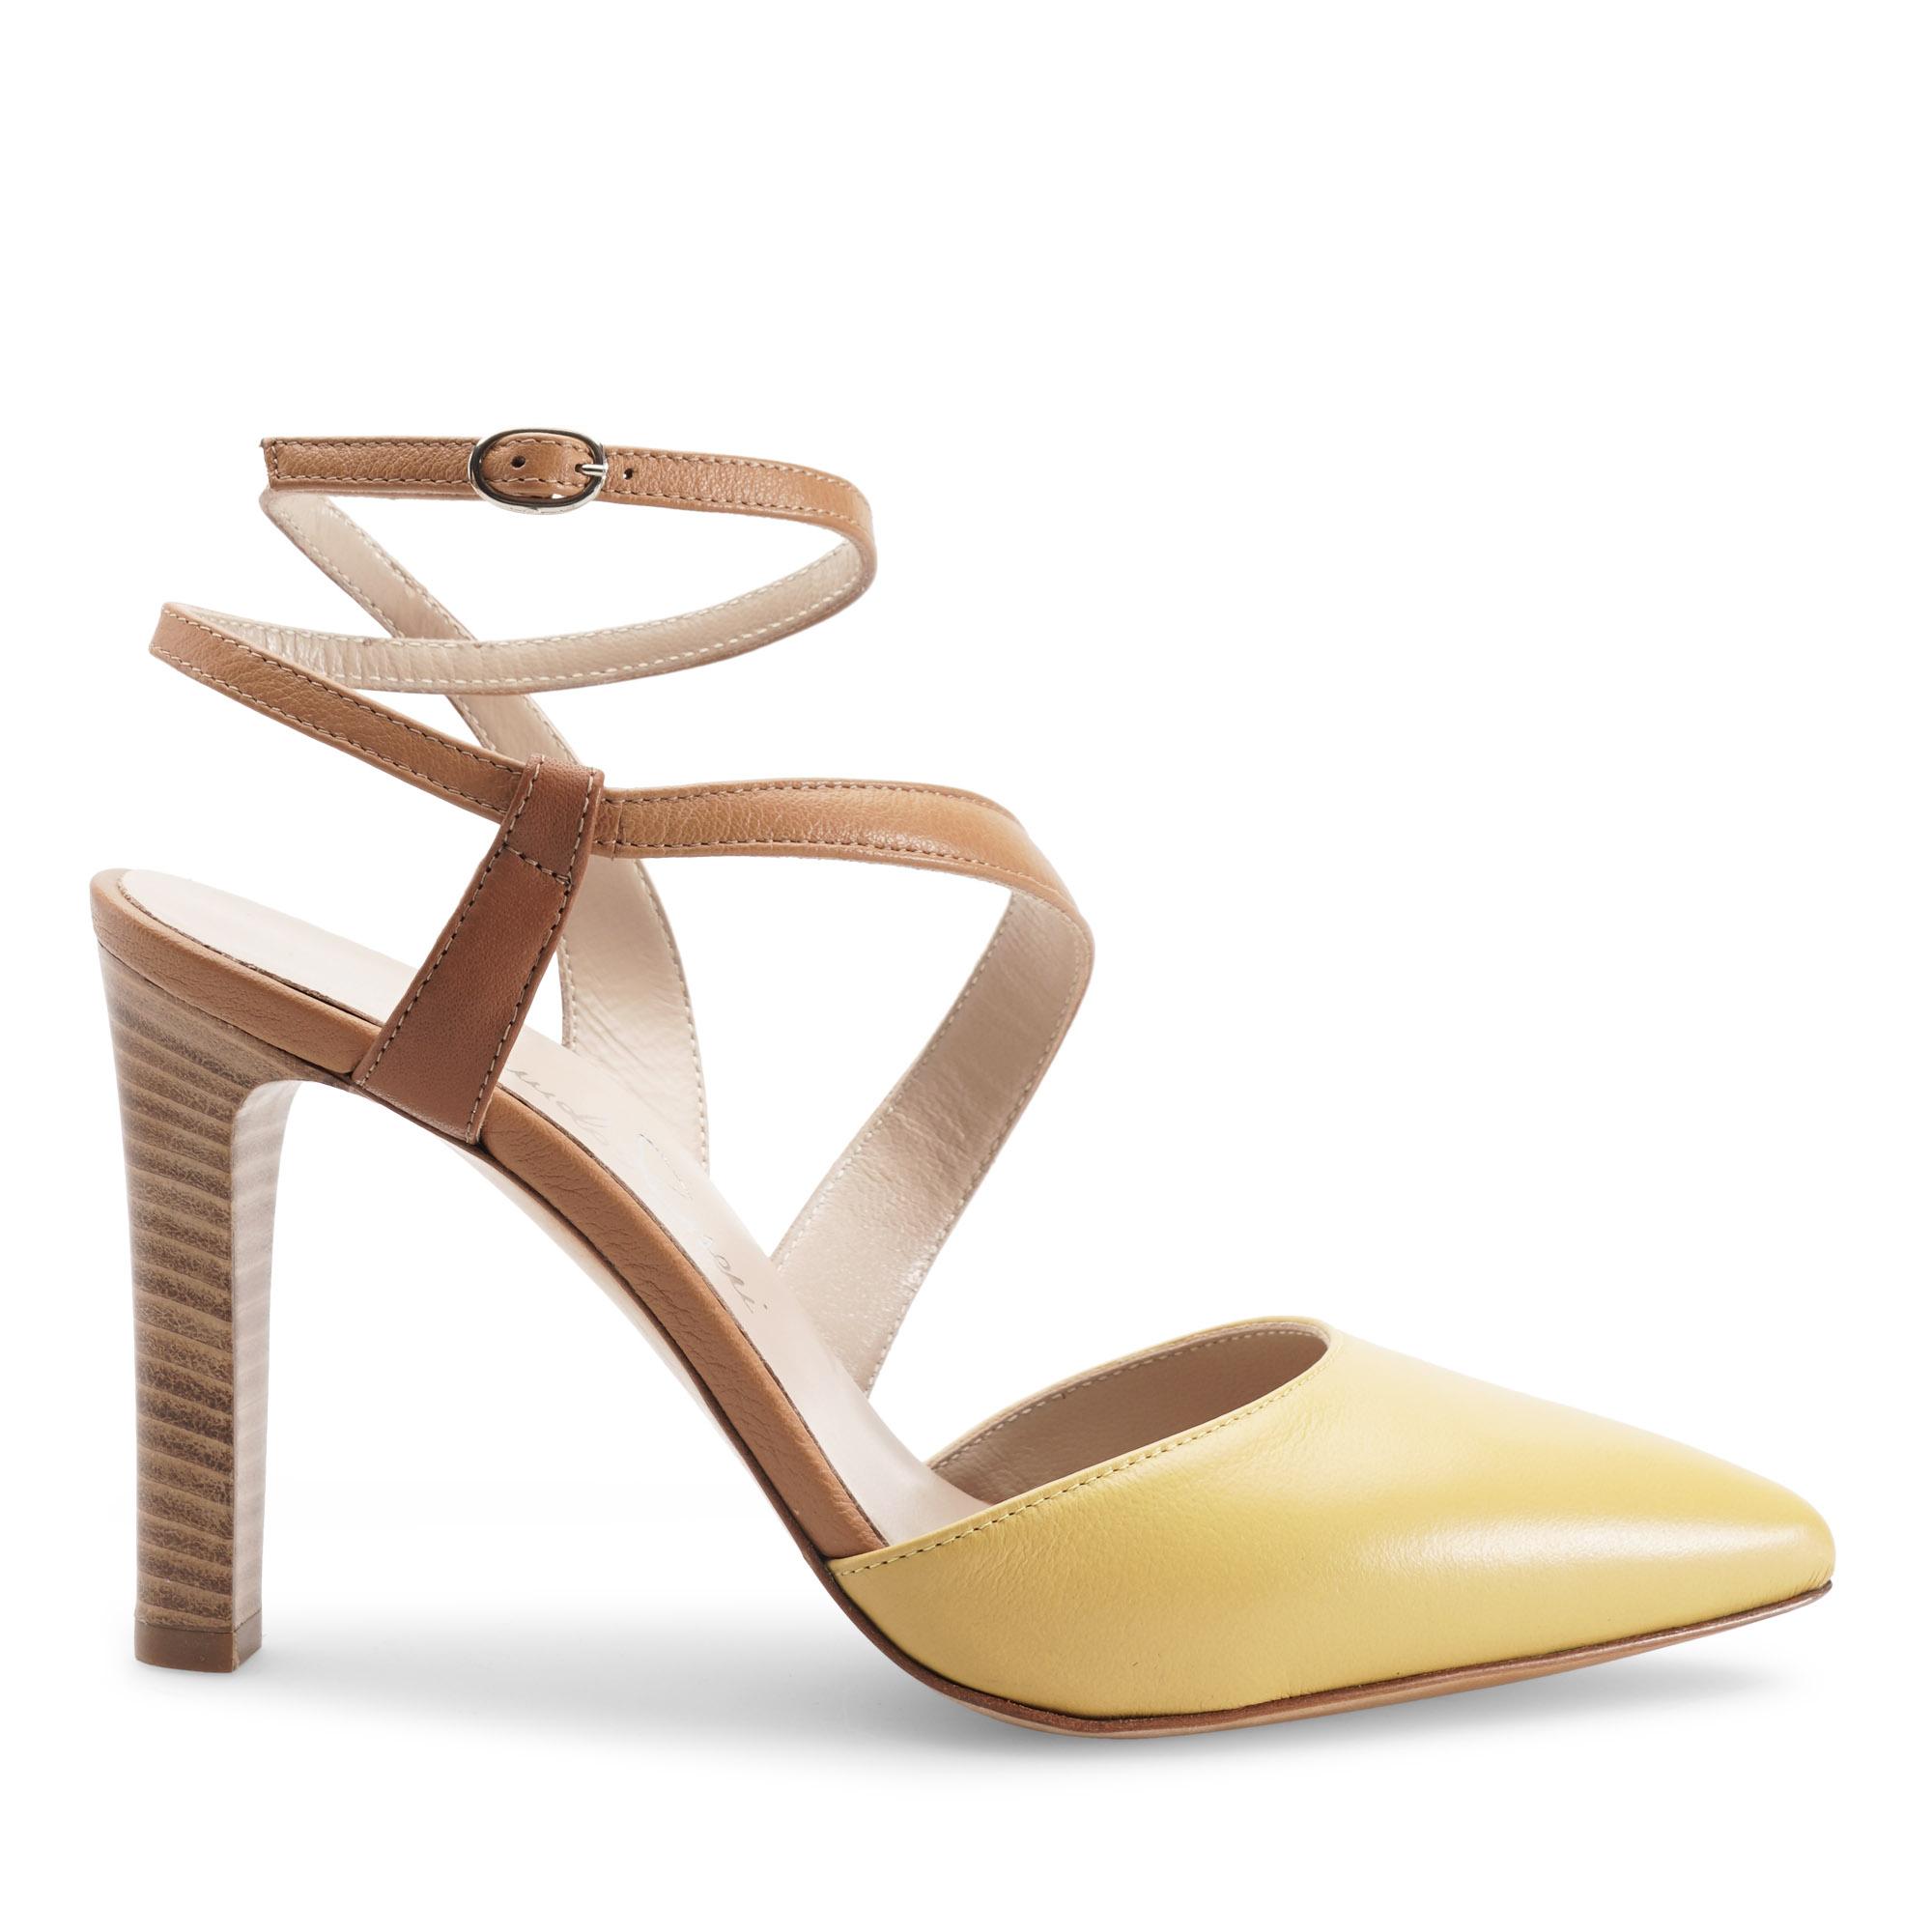 slingback-pelle-giallo-marrone-emanuela-passeri-heels-shoes-spring-summer-2021